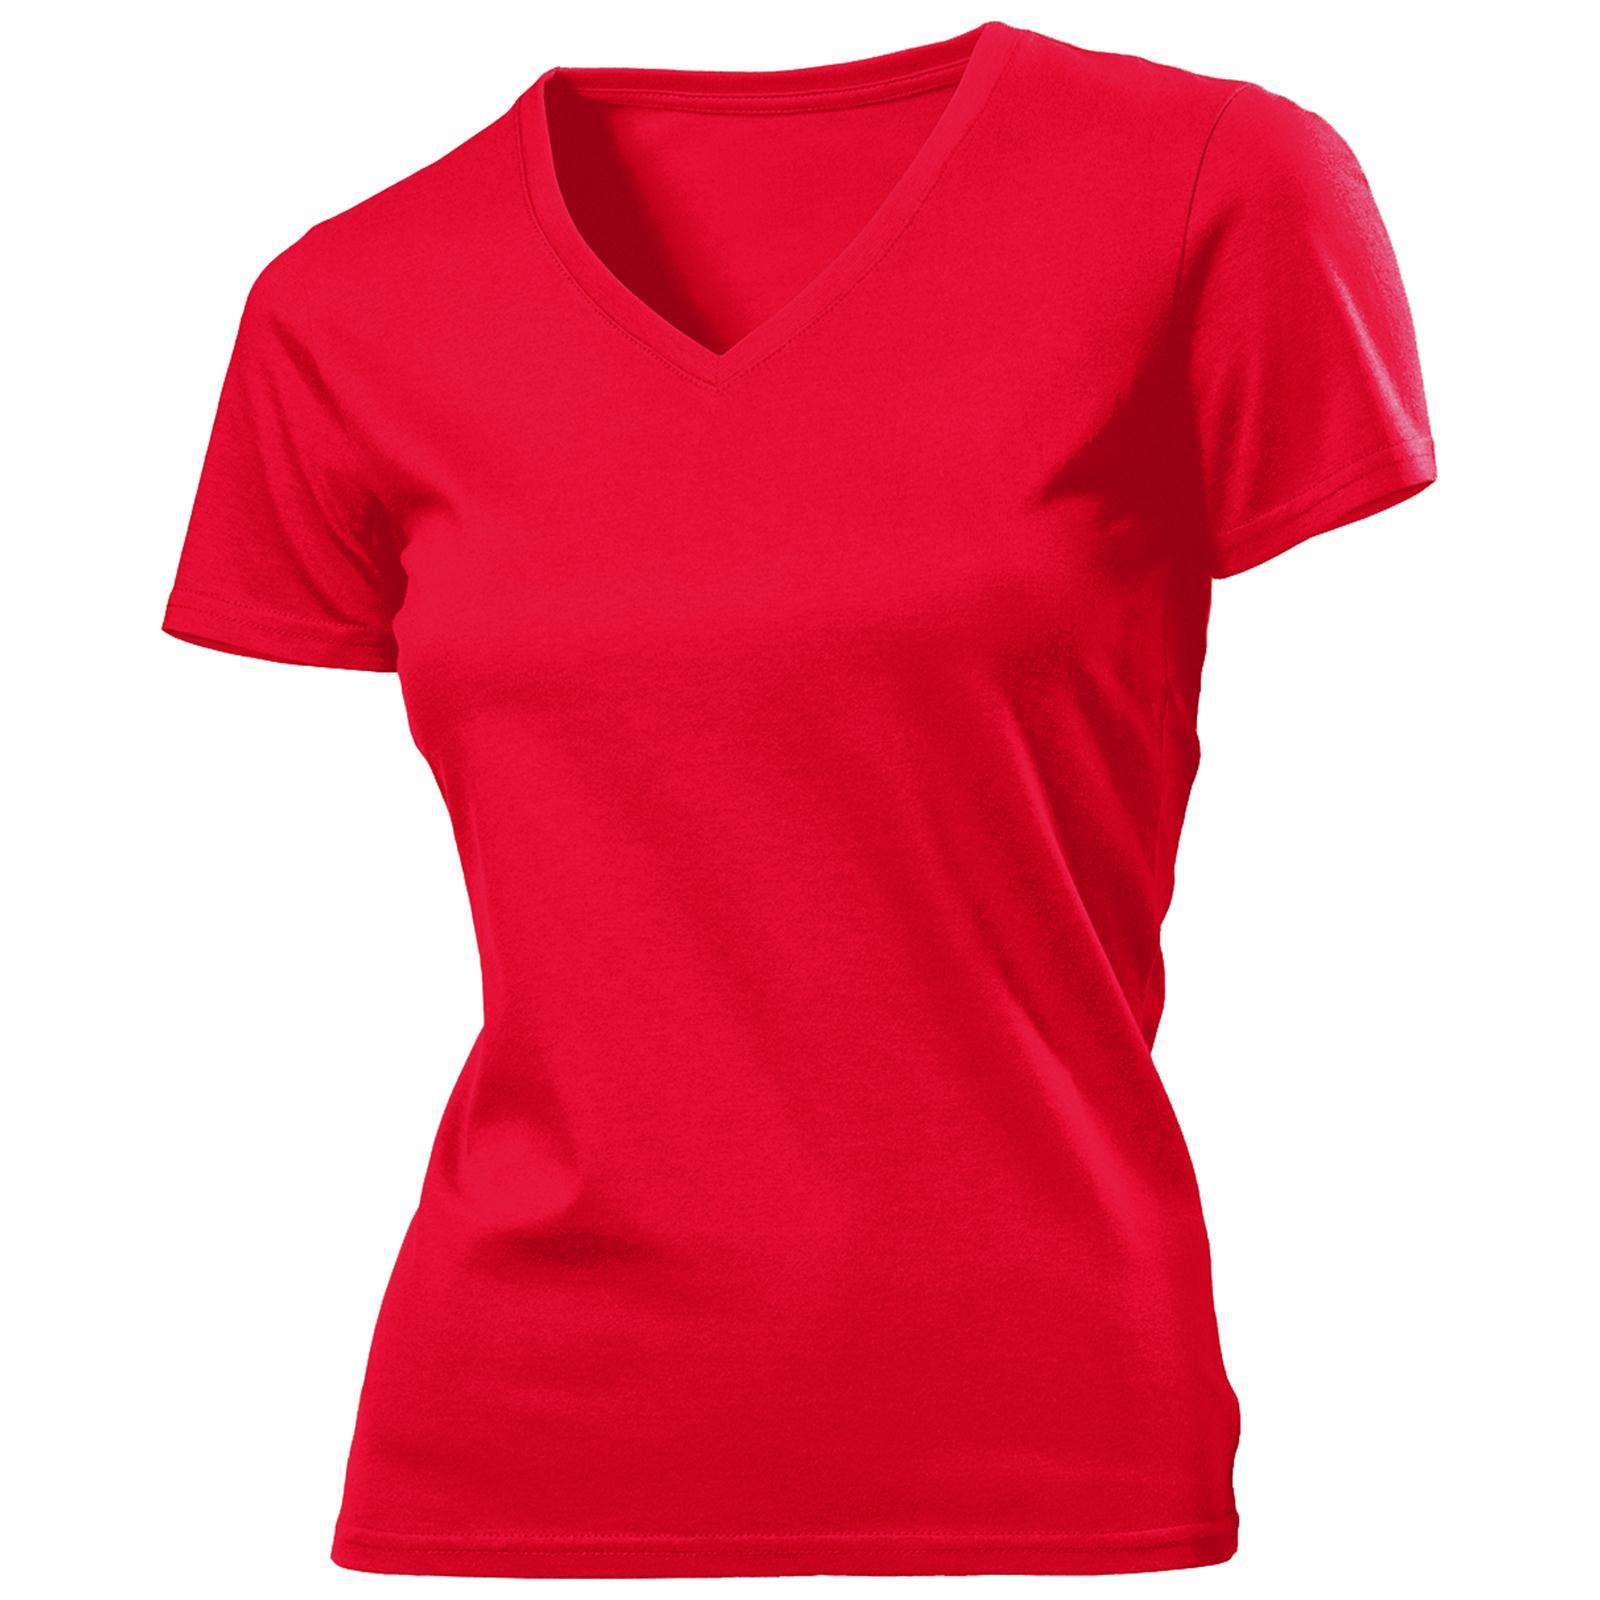 New hanes womens ladies organic soft cotton v neck t shirt for Soft cotton dress shirts